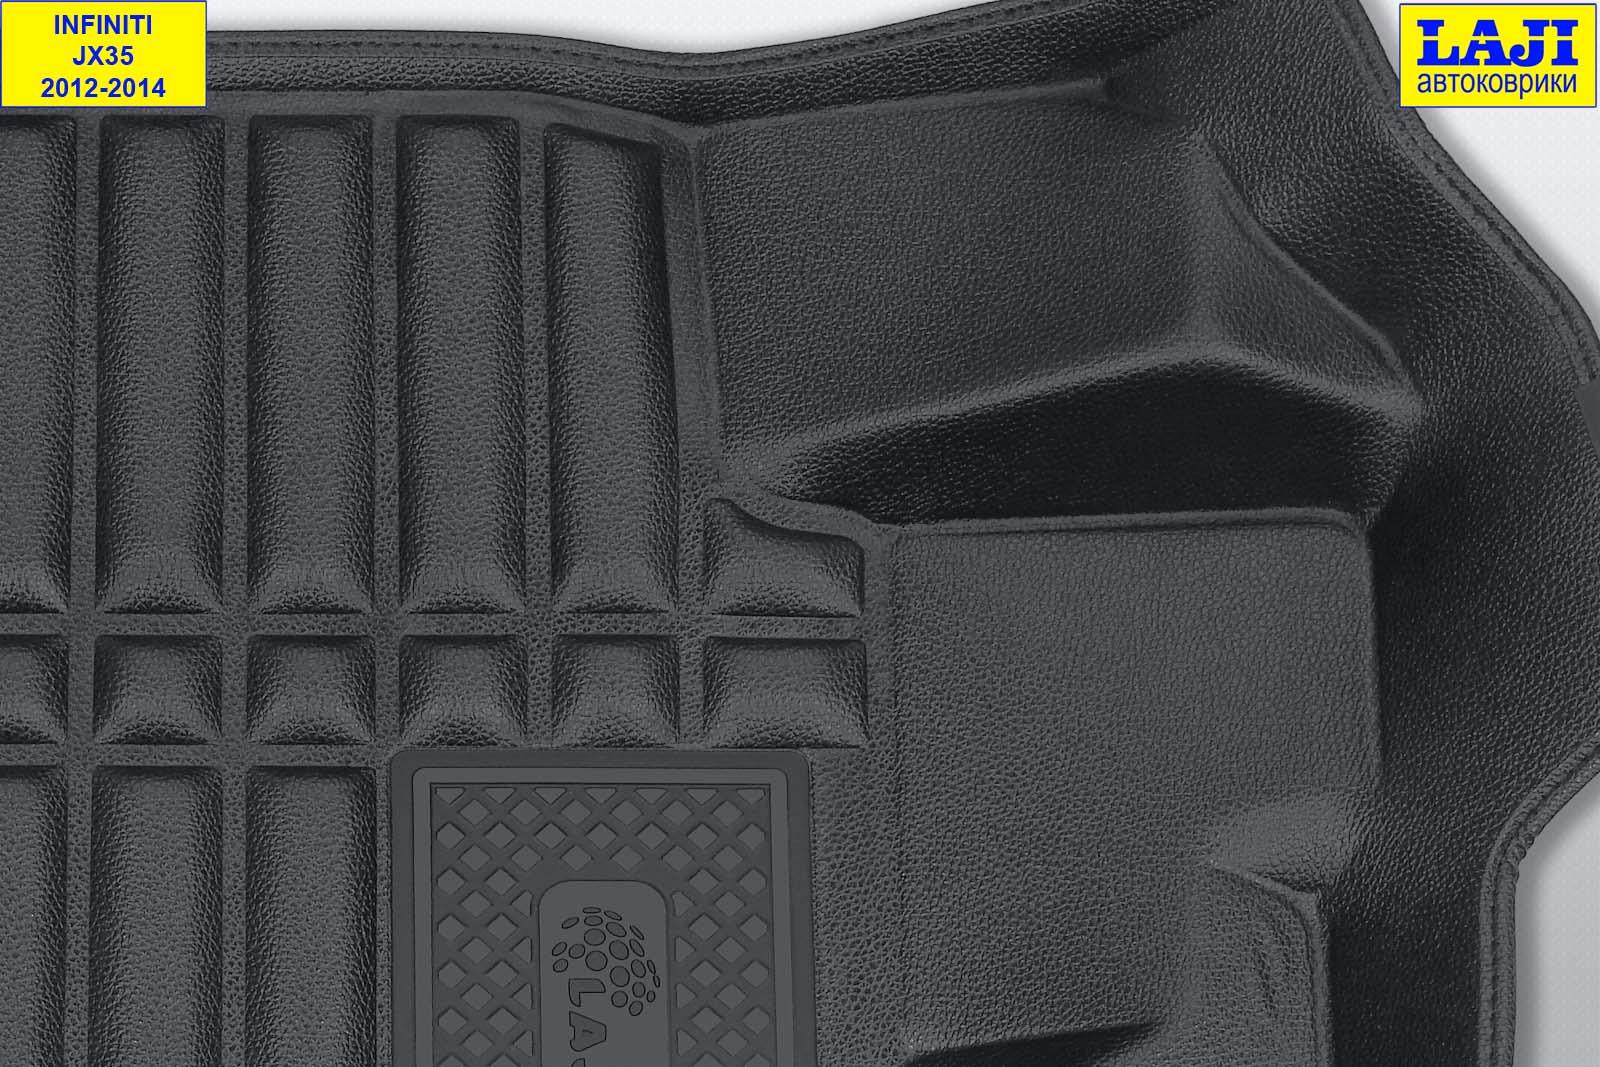 5D коврики в салон Infiniti JX35 2012-2014 6